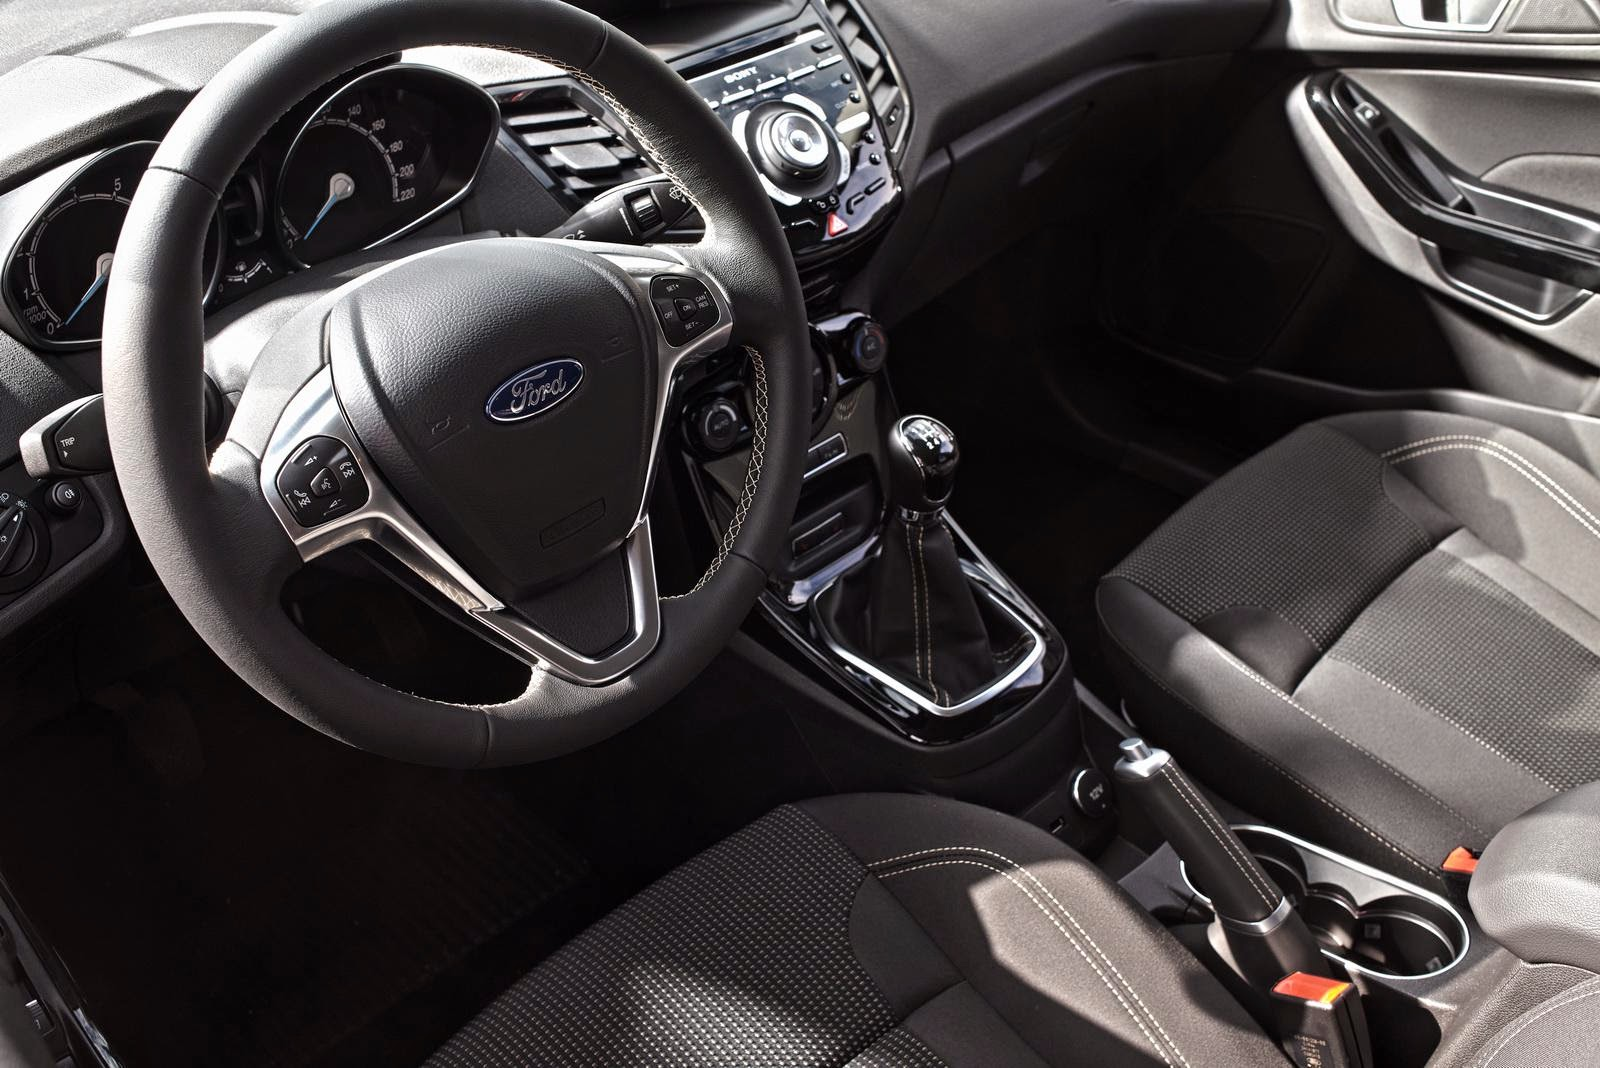 [Resim: Ford%2BFiesta%2B2.jpg]